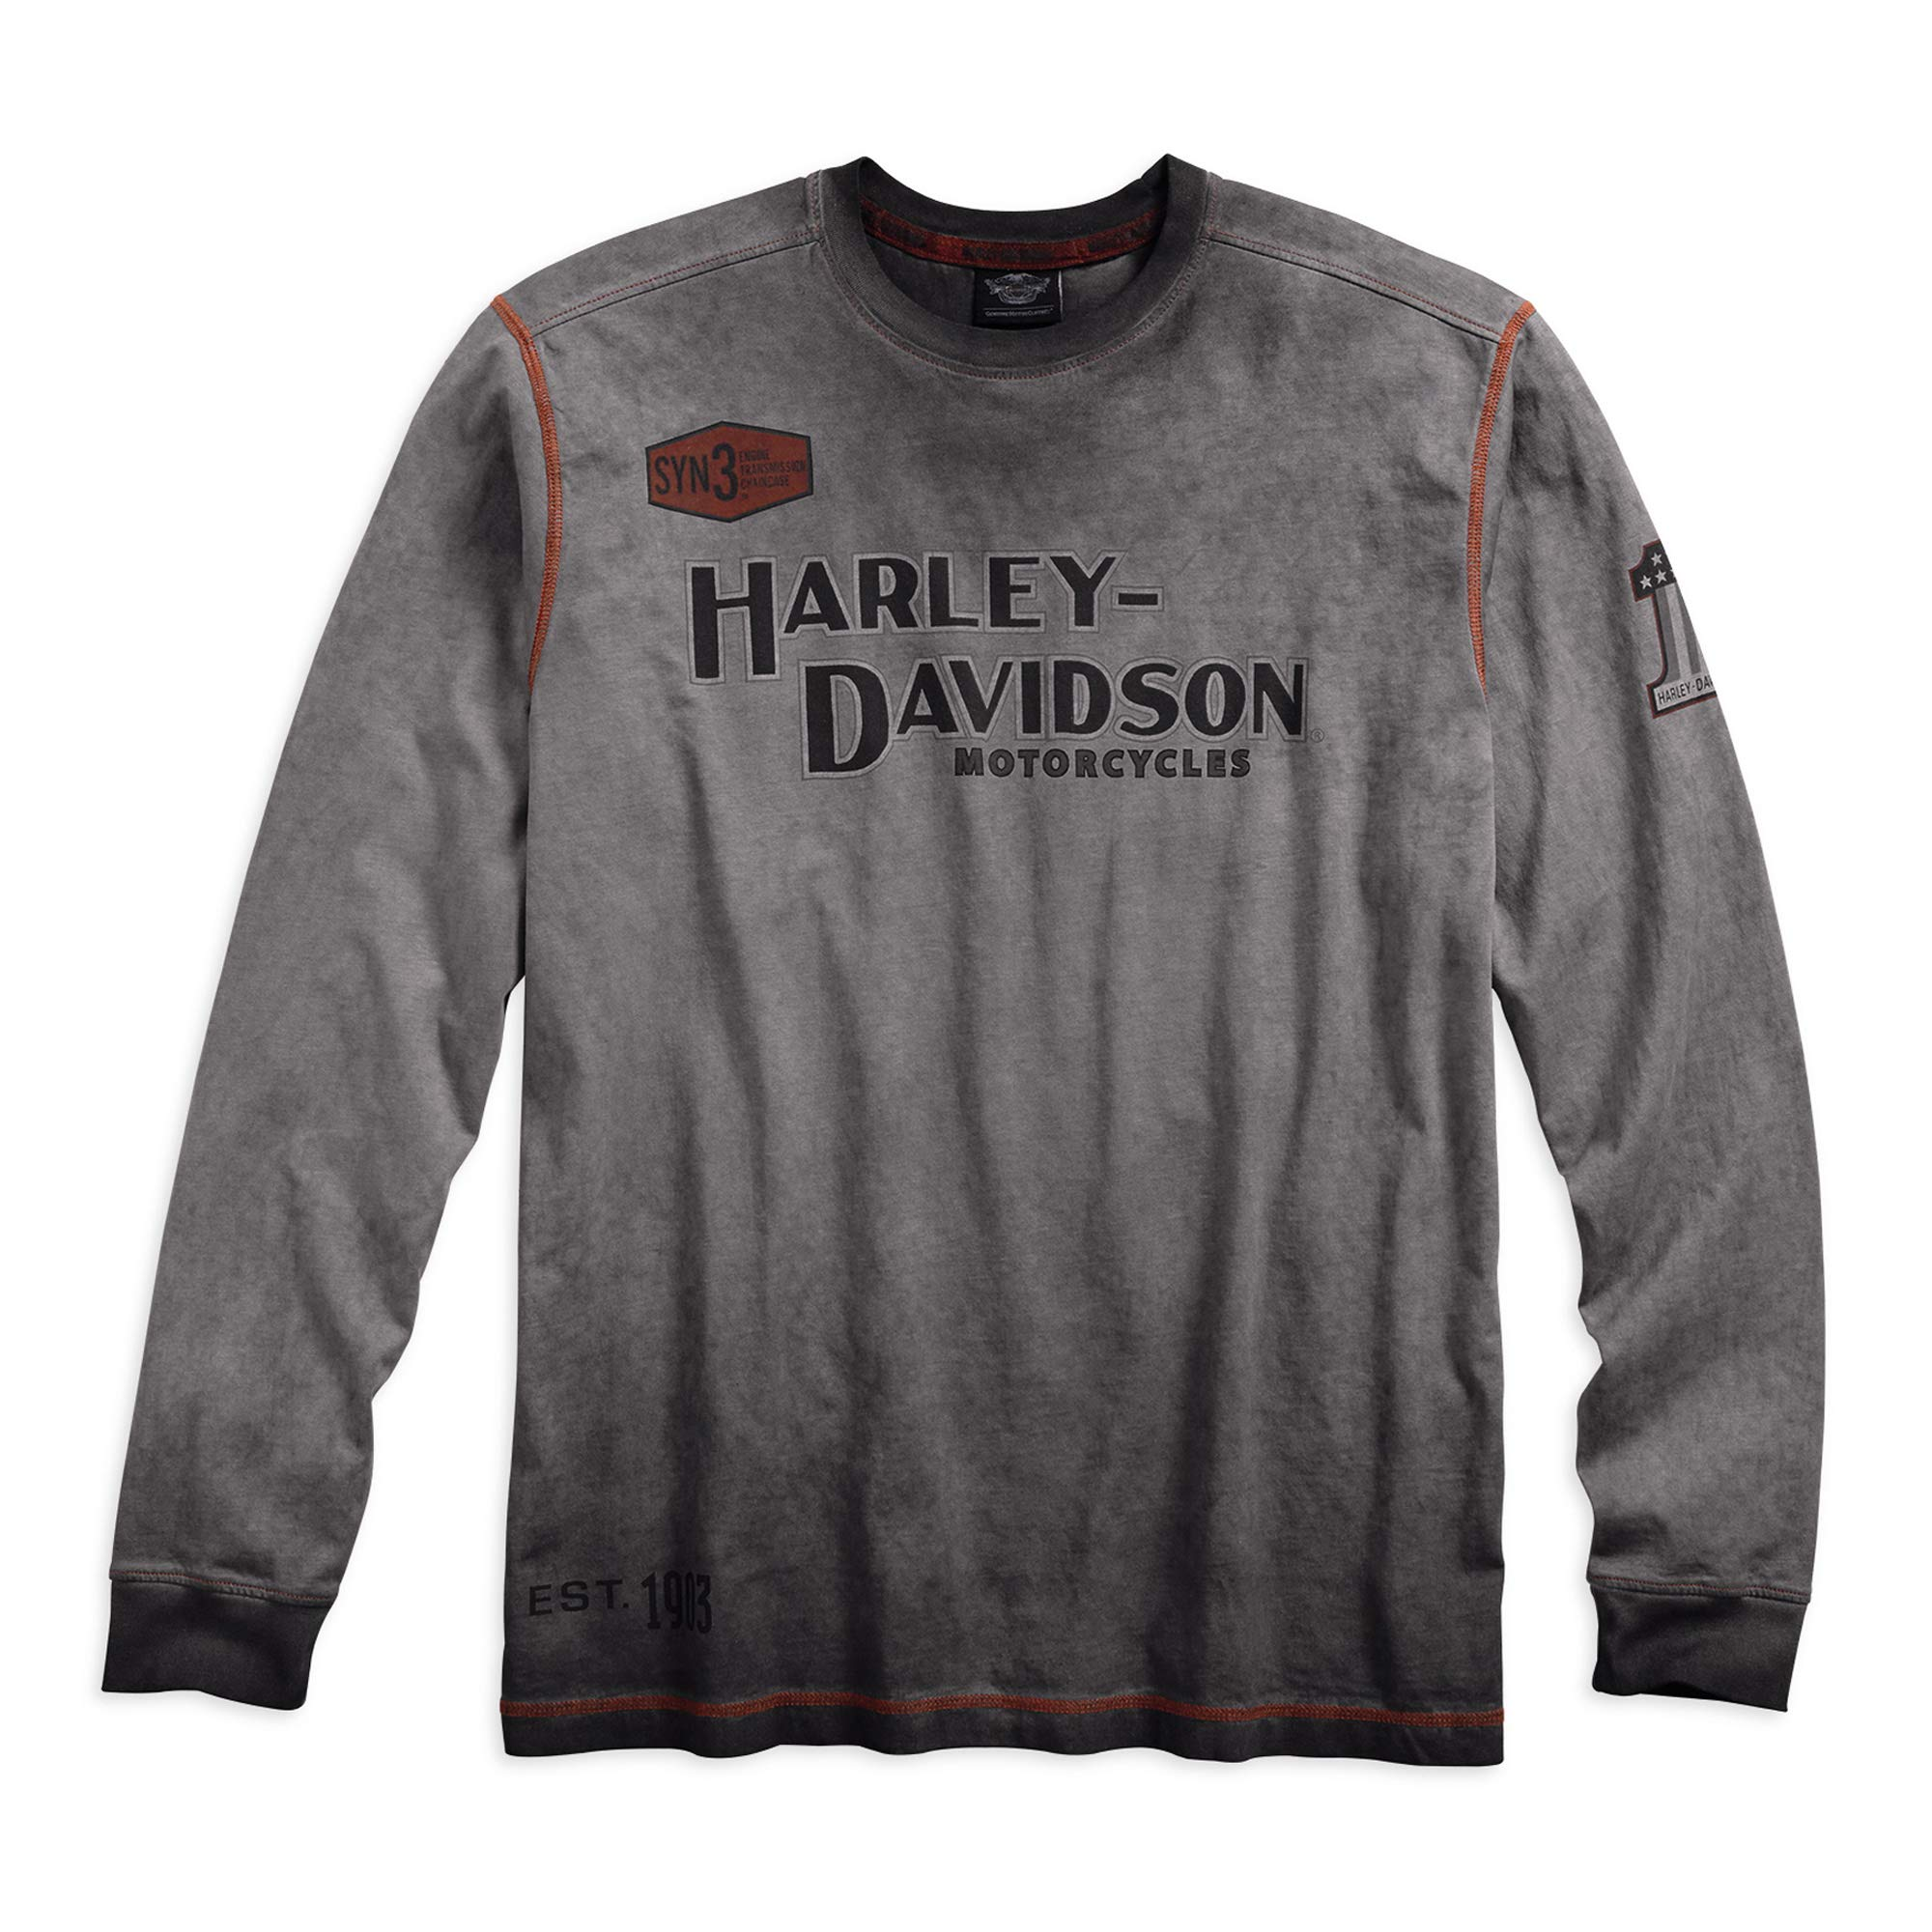 Harley-Davidson Men's Iron Block Long Sleeve Tee, Grey